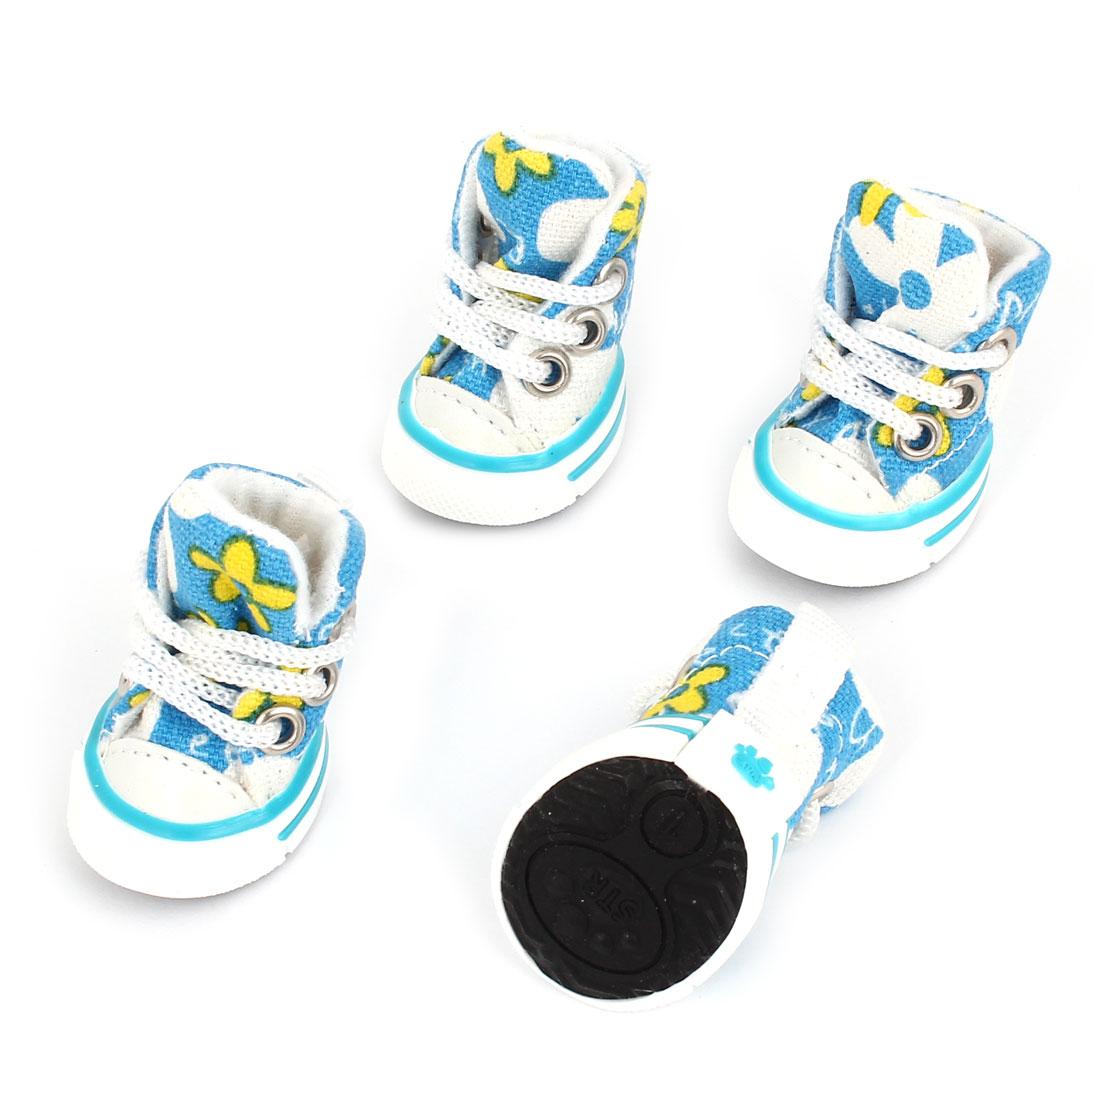 2 Pairs Nylon Shoe String Rubber Sole Flower Print Pet Dog Shoes Sneakers Blue White Size XXS